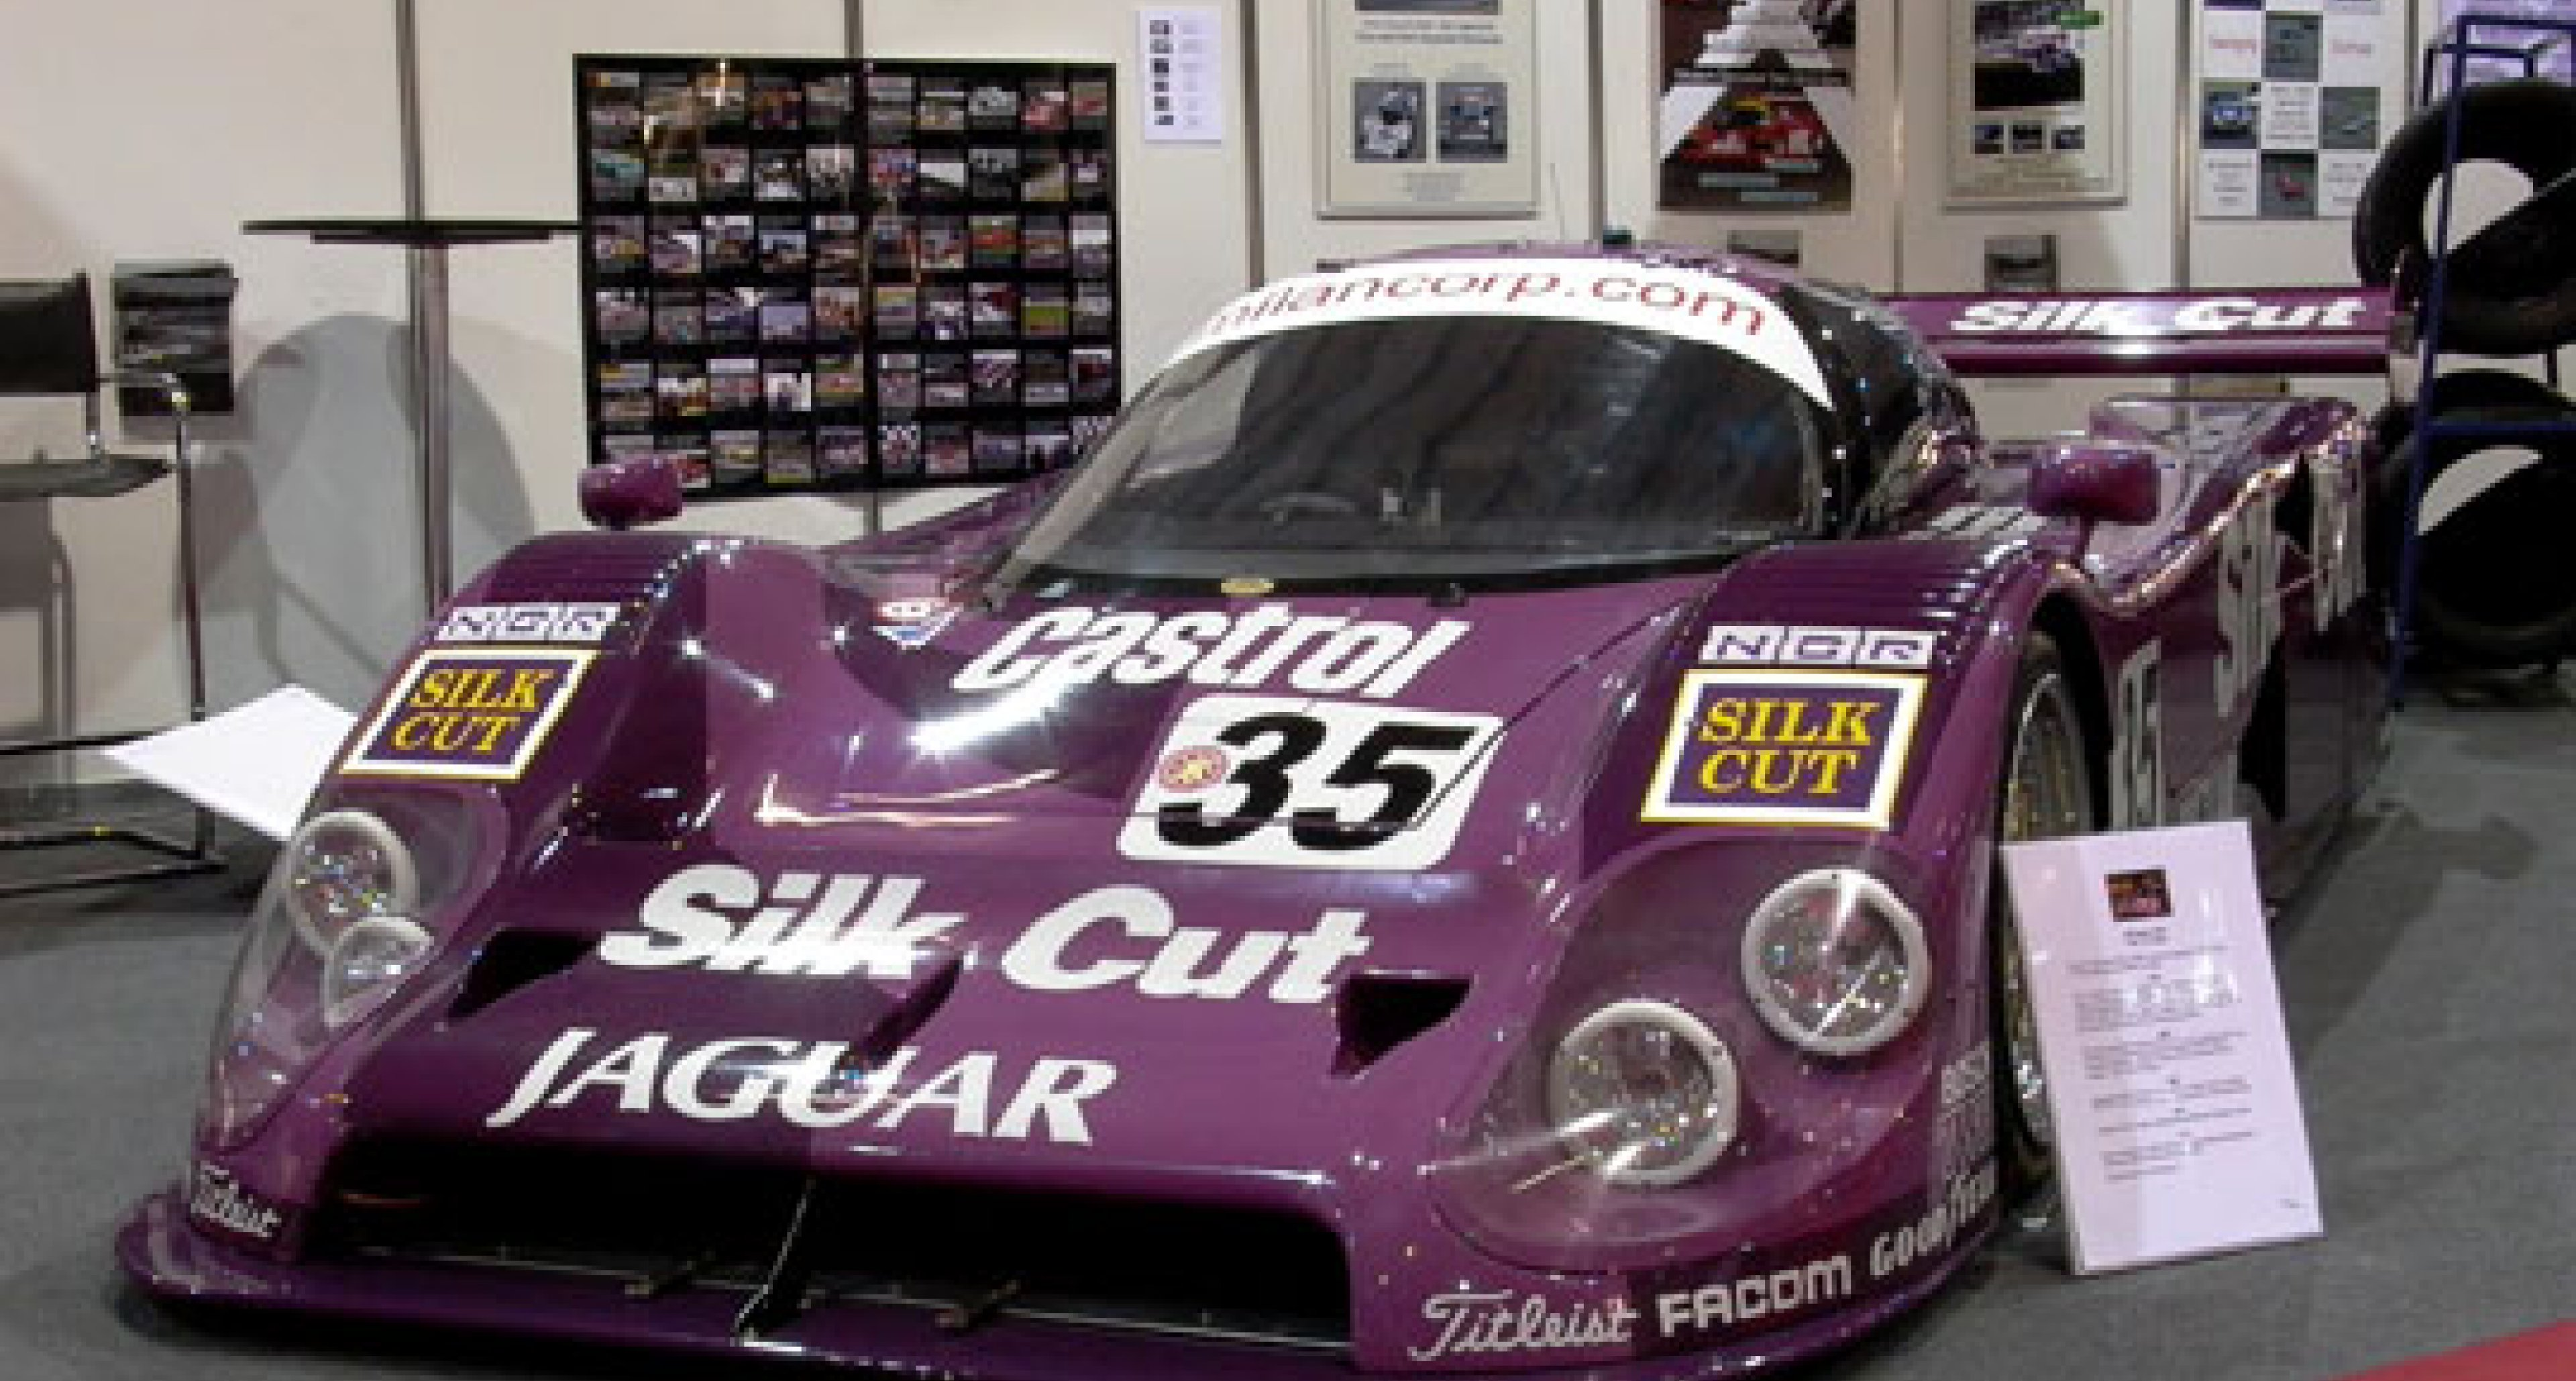 The Second International Historic Motorsport Show